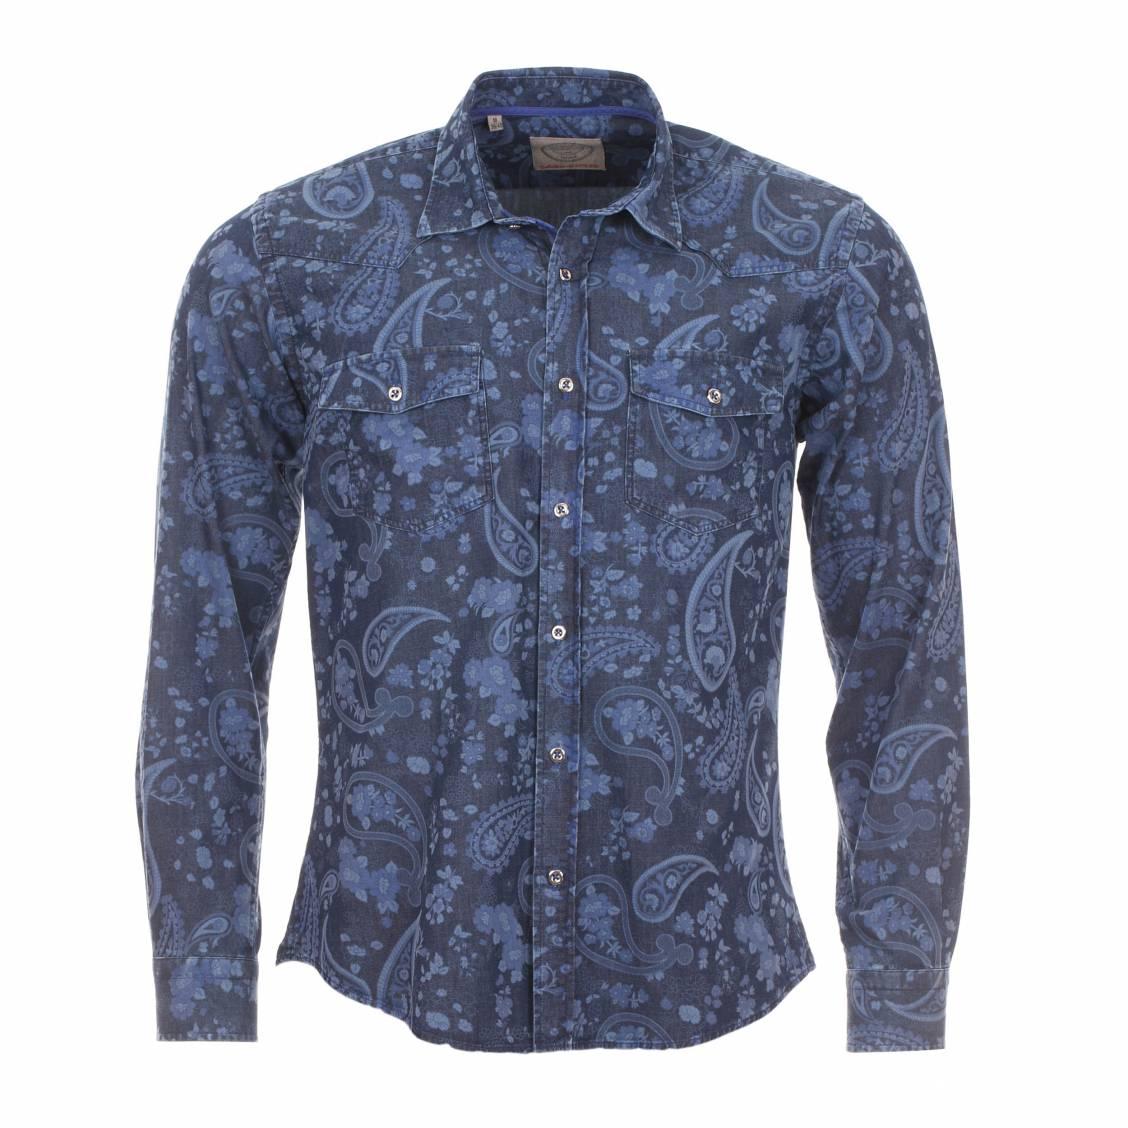 chemise homme cintr e m adrine bleu jean motifs cachemire opposition fleurs rue des hommes. Black Bedroom Furniture Sets. Home Design Ideas